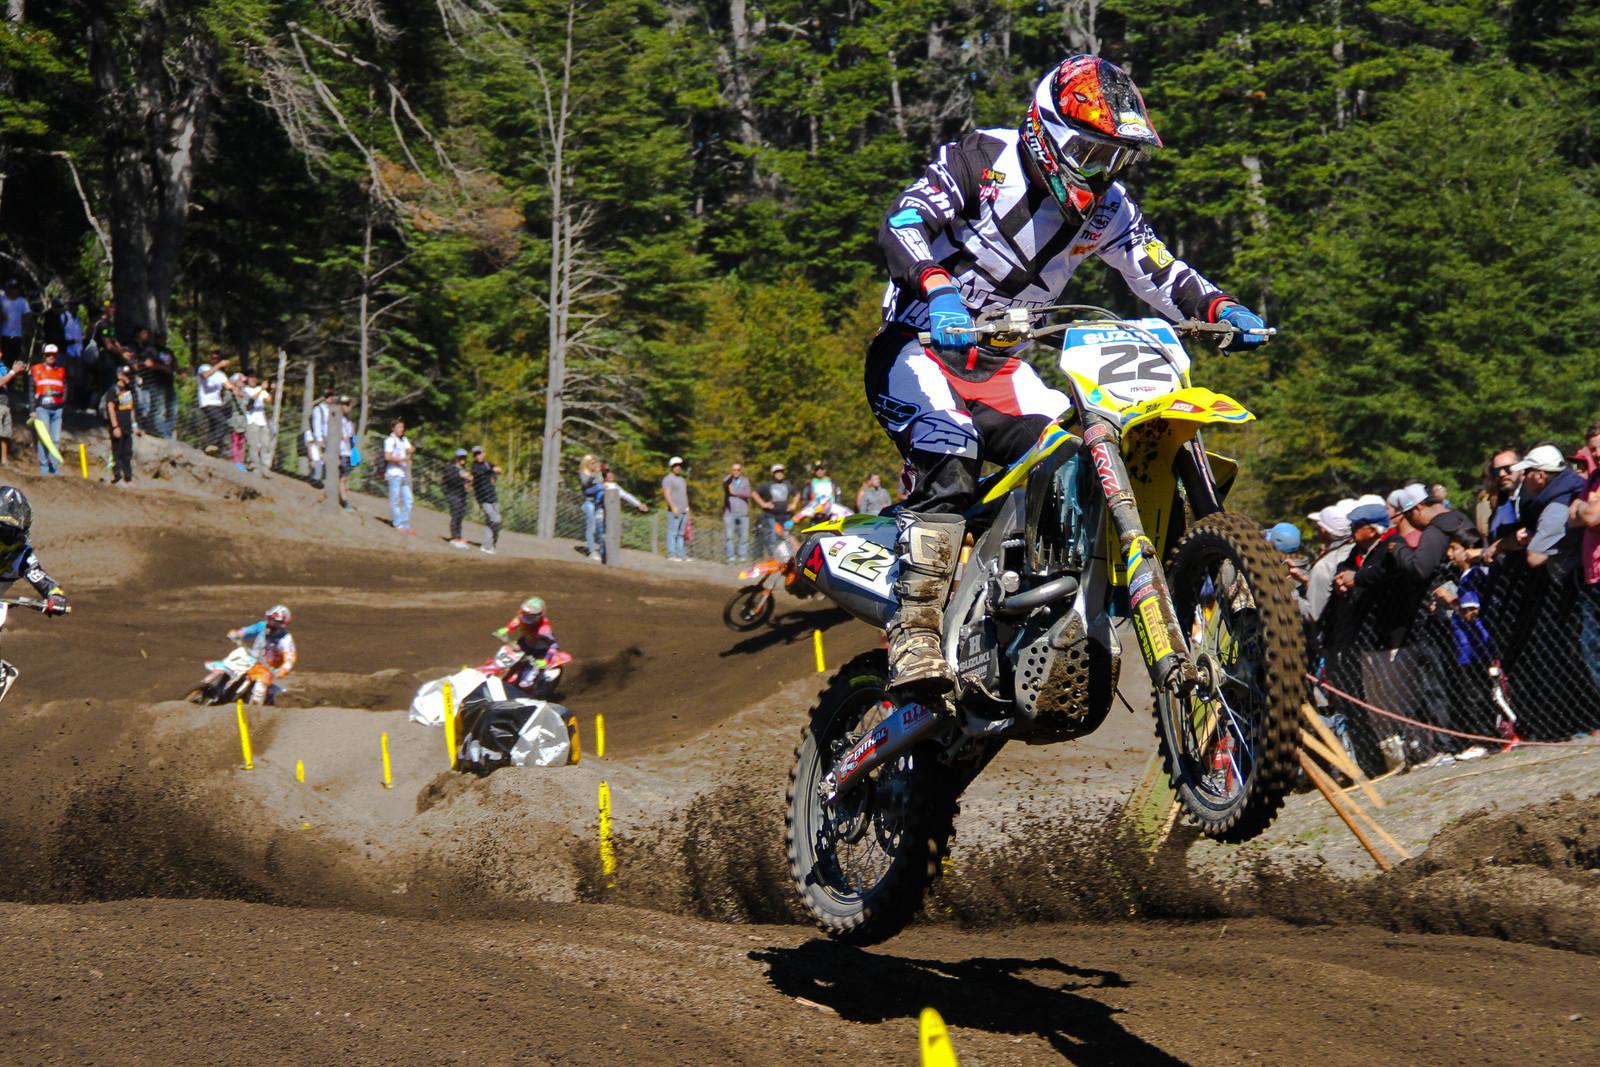 Kevin Strijbos - Photo Blast: 2017 MXGP of Argentina - Motocross Pictures - Vital MX